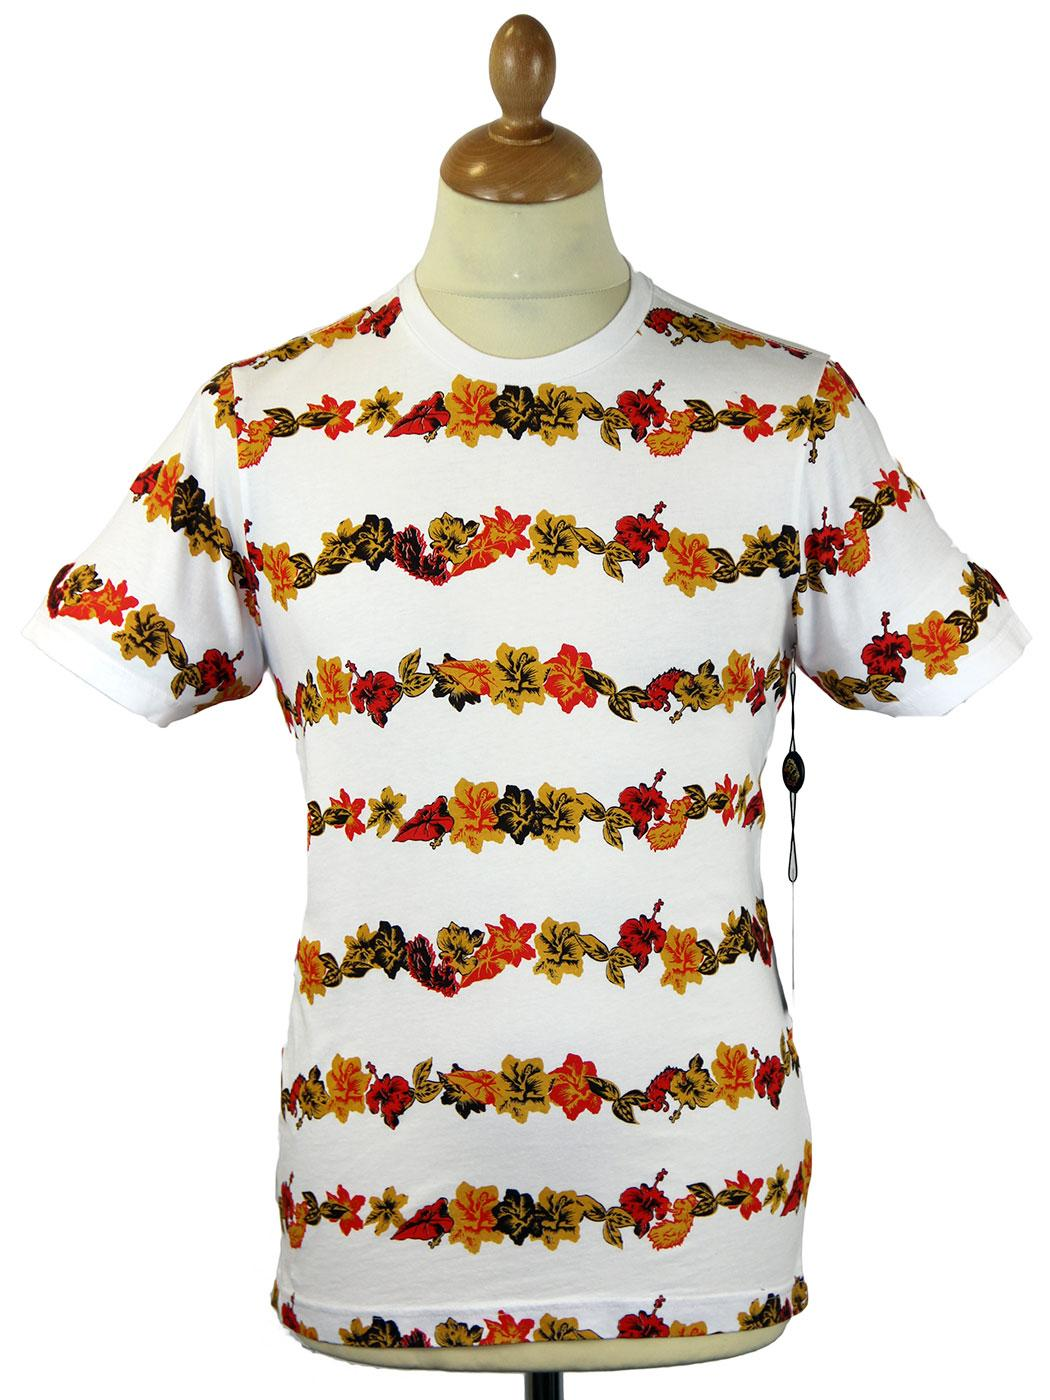 Vine LUKE 1977 Retro Mod Floral Stripe T-Shirt